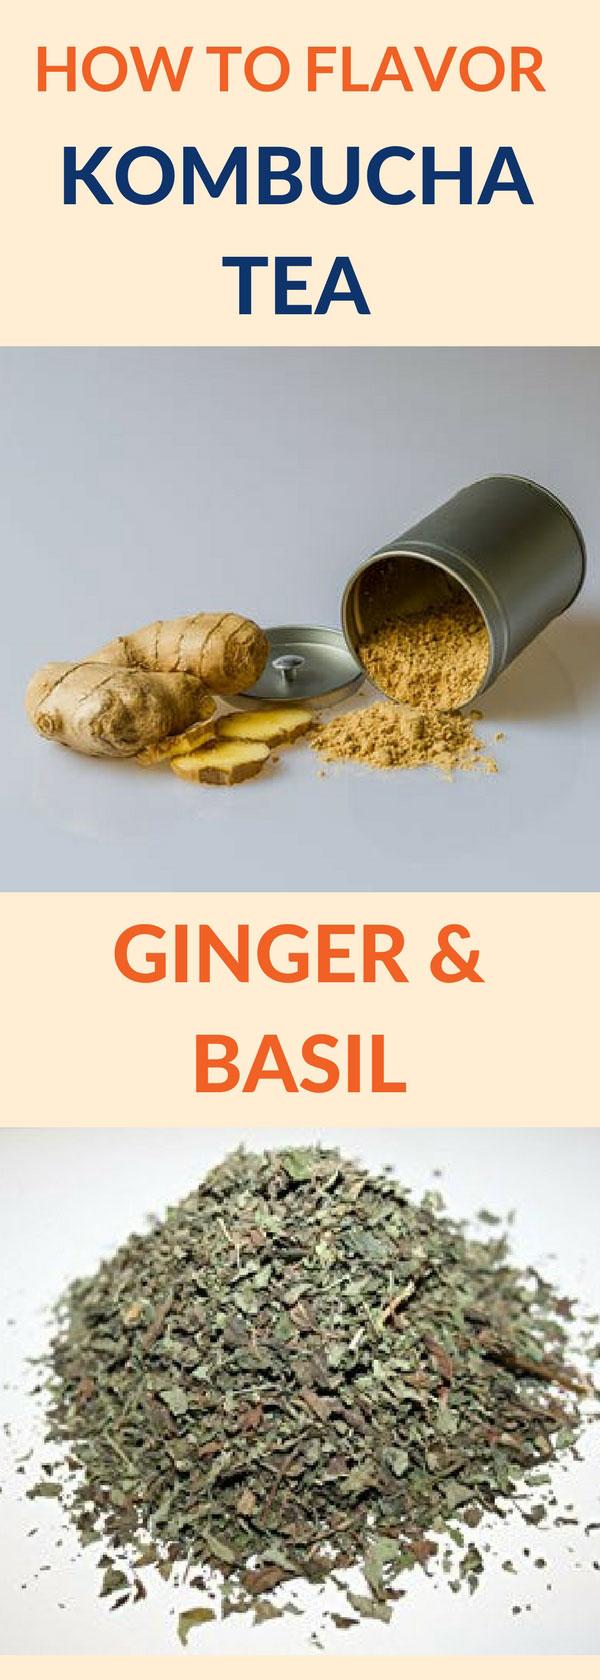 flavor kombucha ginger basil pin